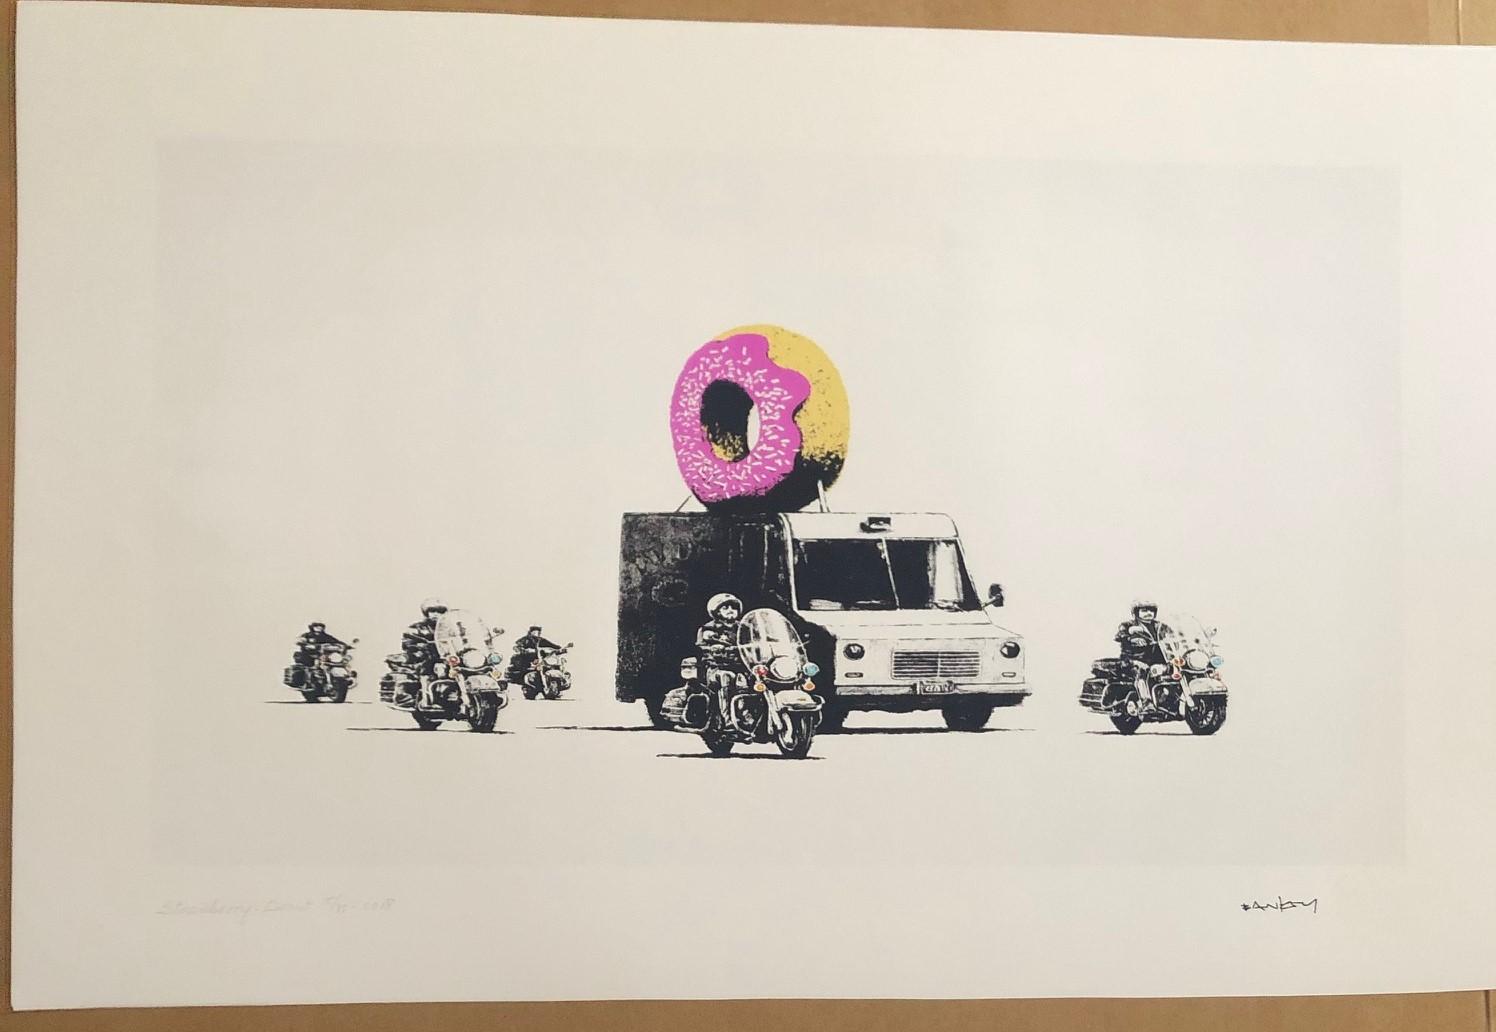 Strawberry Donut by   Banksy - Masterpiece Online